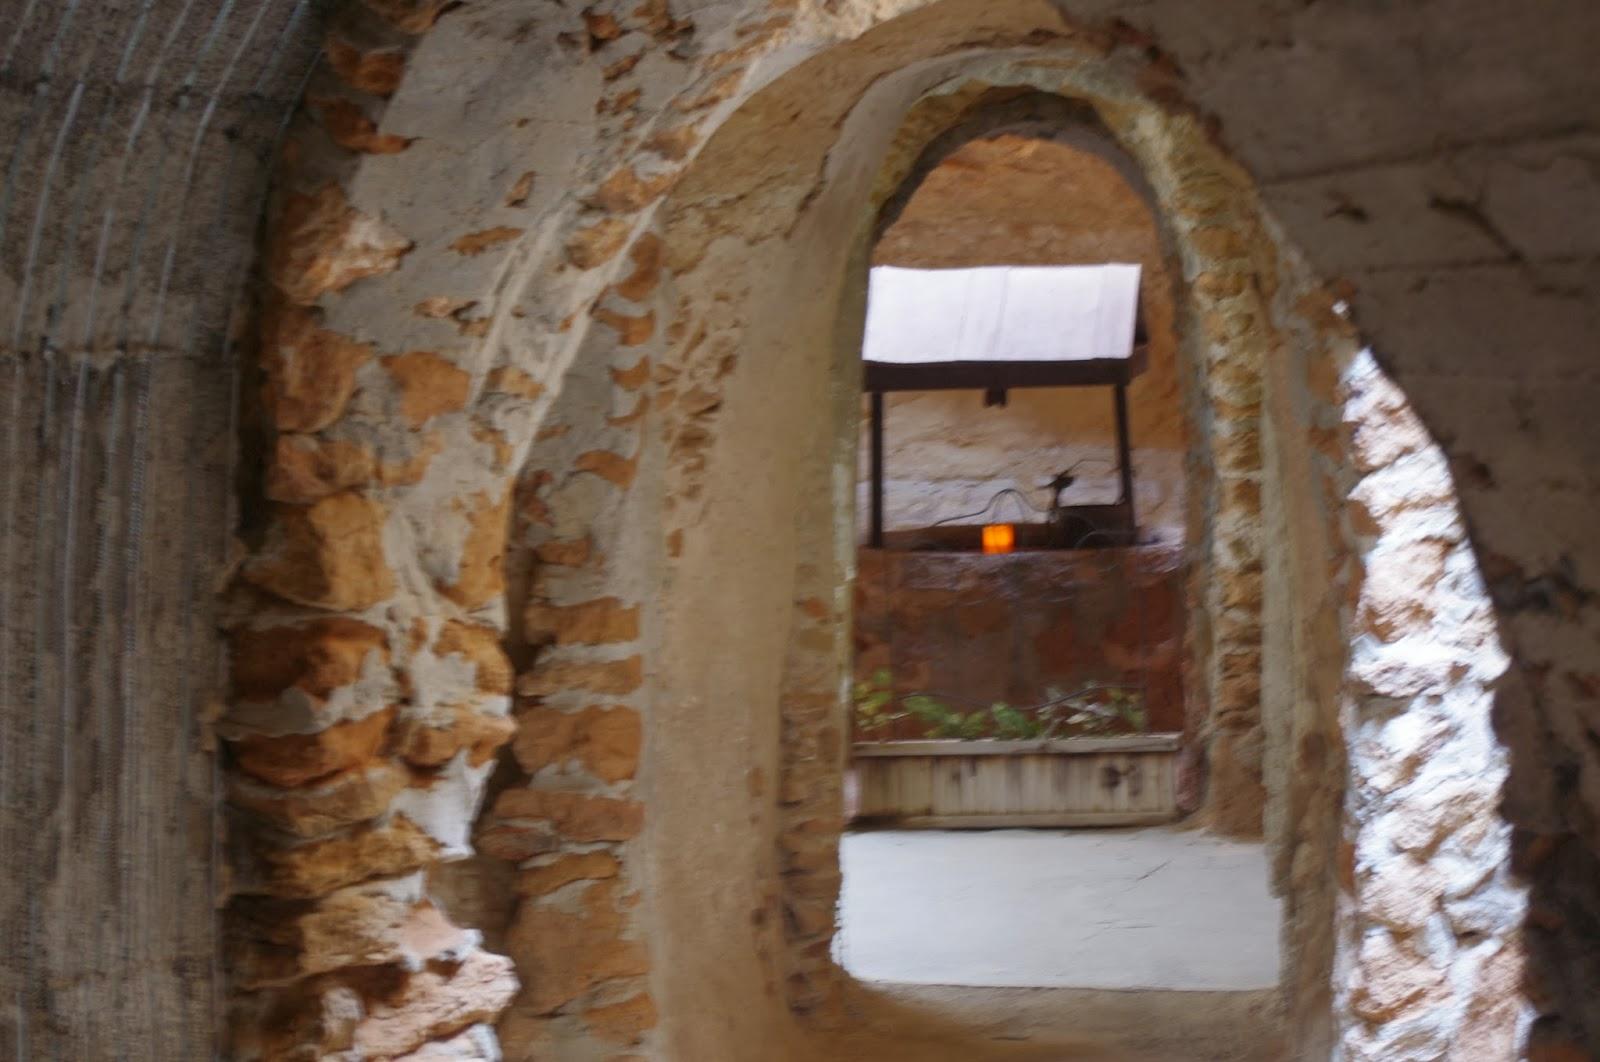 Sunday, September 16th - Baldassare Forestiere | Adventures in the ...